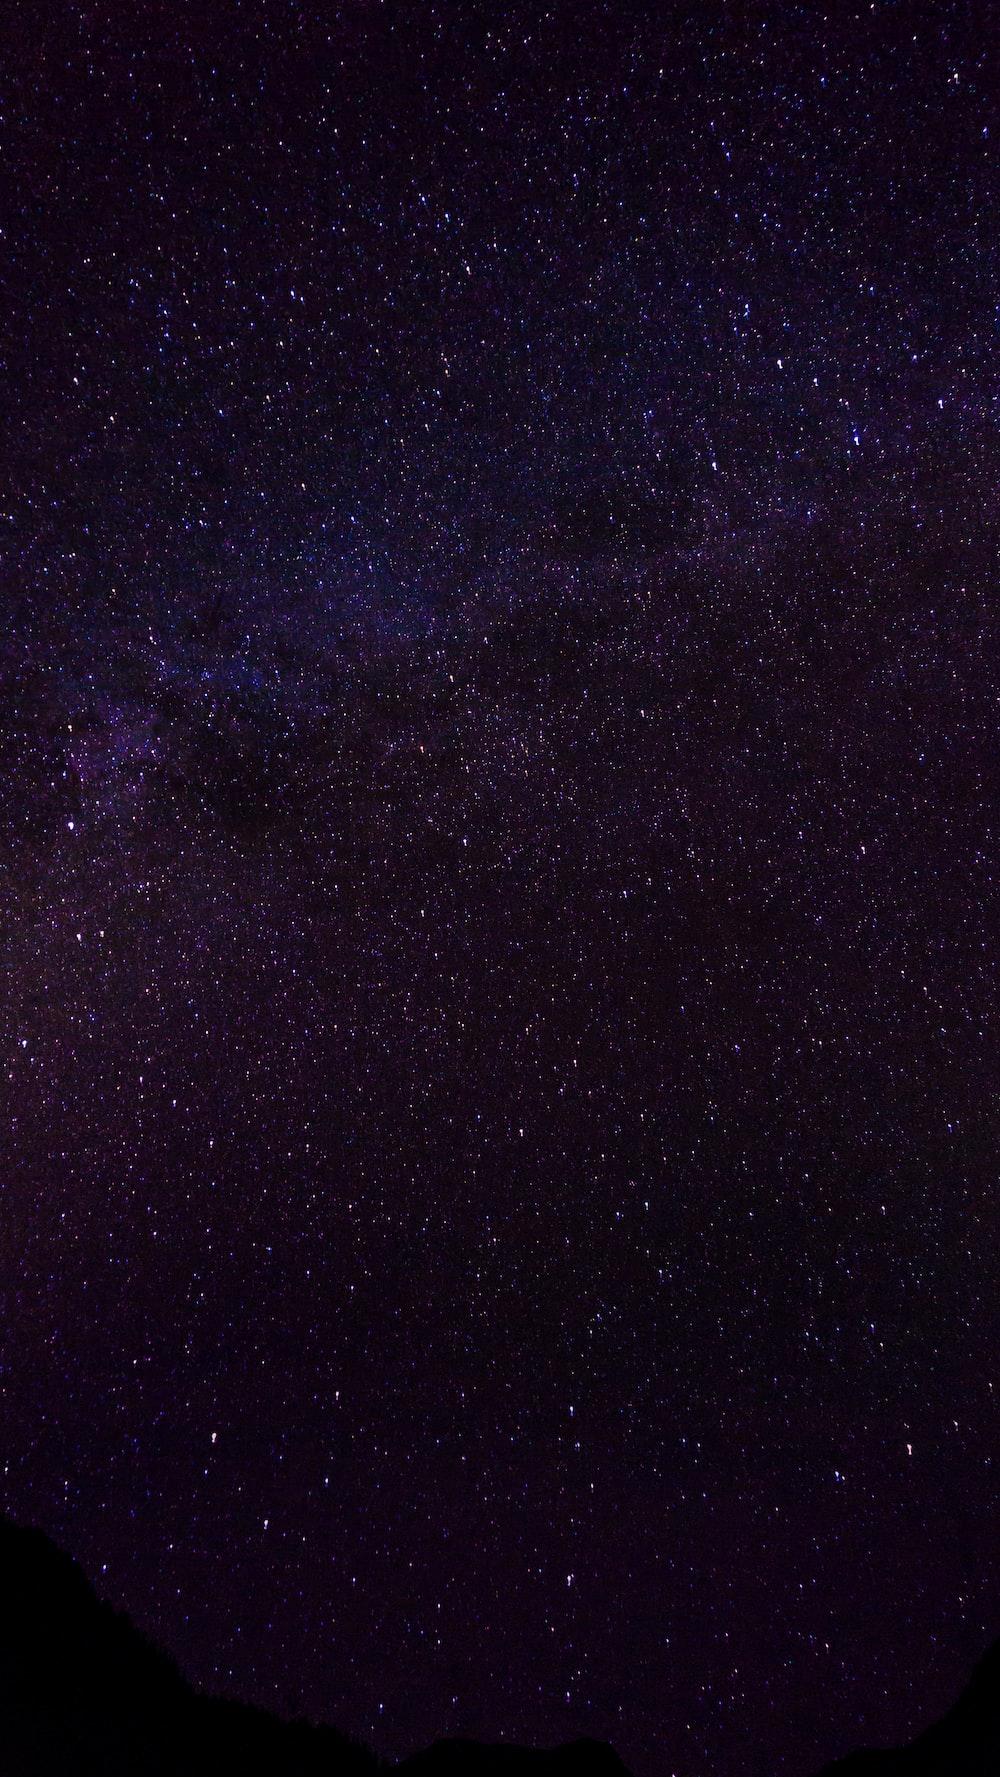 purple galaxy wallpaper photo – Free Black Image on Unsplash